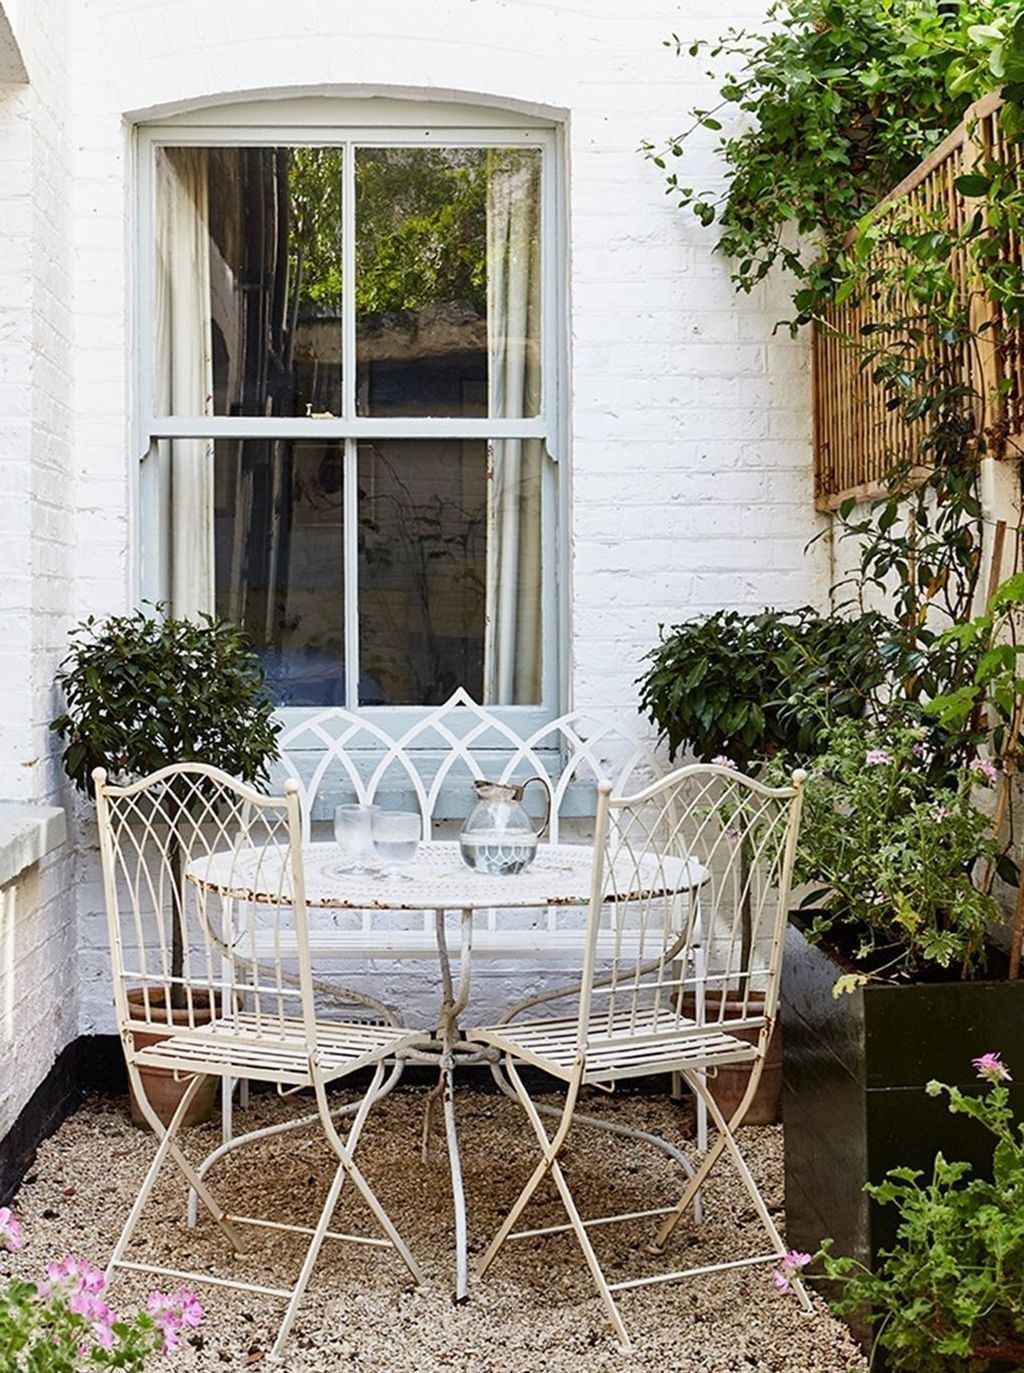 Gorgeous Patio Garden Furniture Ideas 32 In 2020 Small Cottage Garden Ideas Diy Garden Furniture Backyard Inspiration